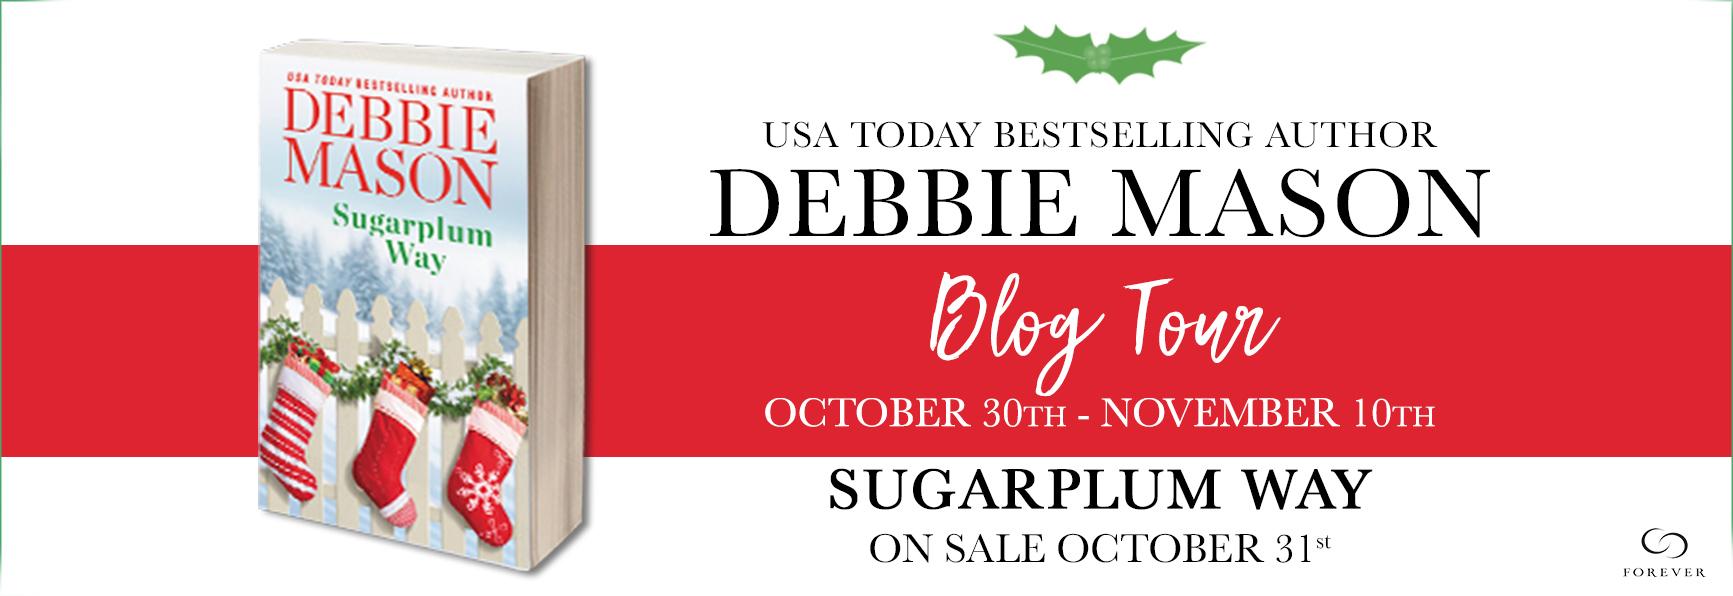 SUGARPLUM WAY by Debbie Mason